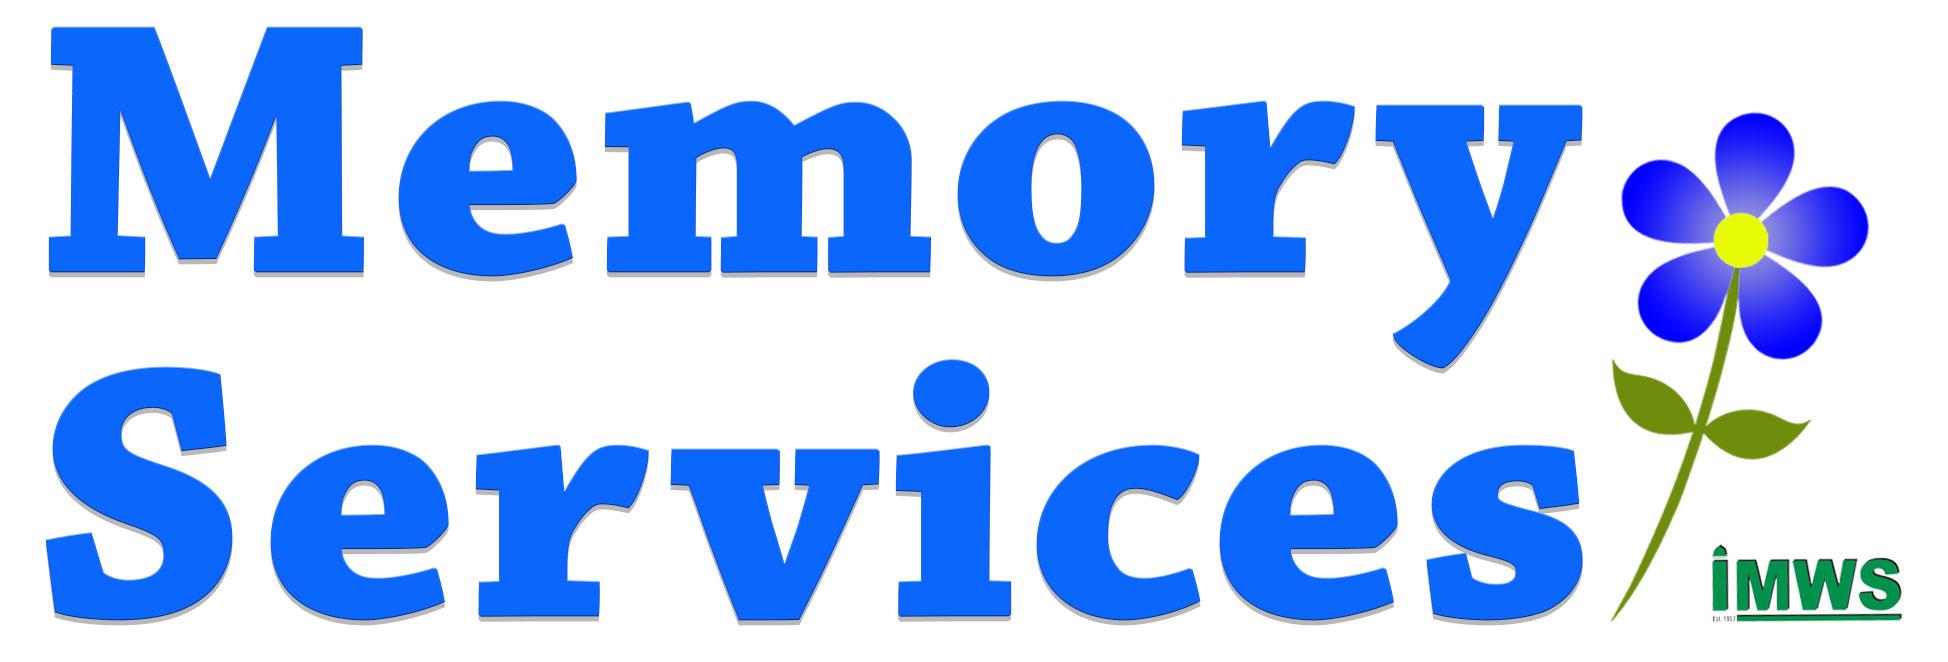 memeory-services-logo-v2